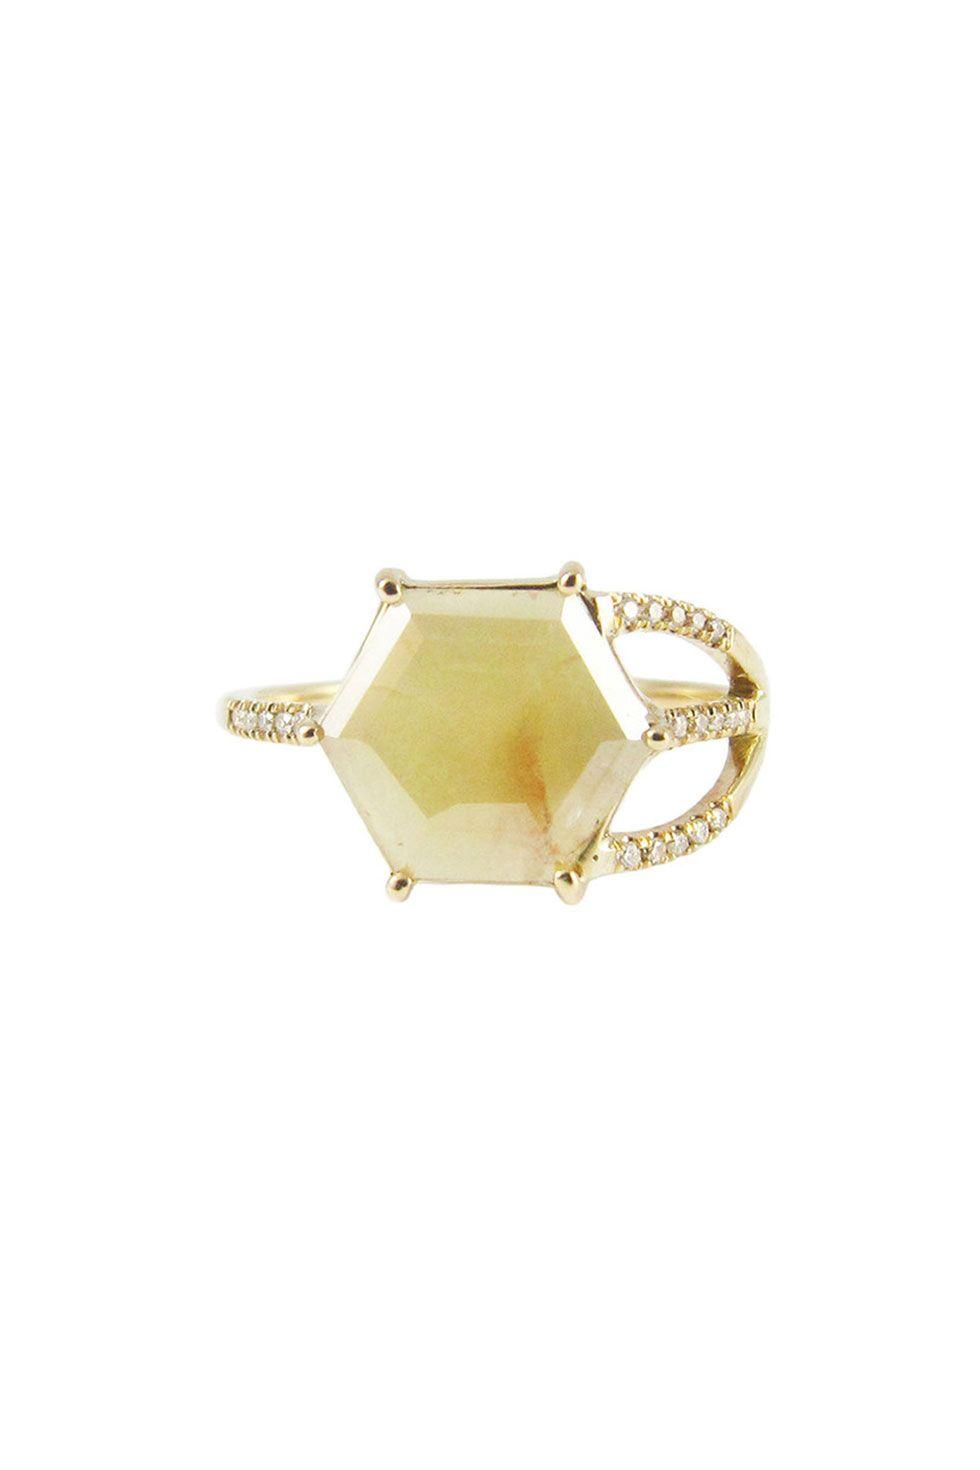 Jenniw Kwon Hexagon Slice Half Cage Ring, $4,500; jenniekwondesigns.com   - ELLE.com